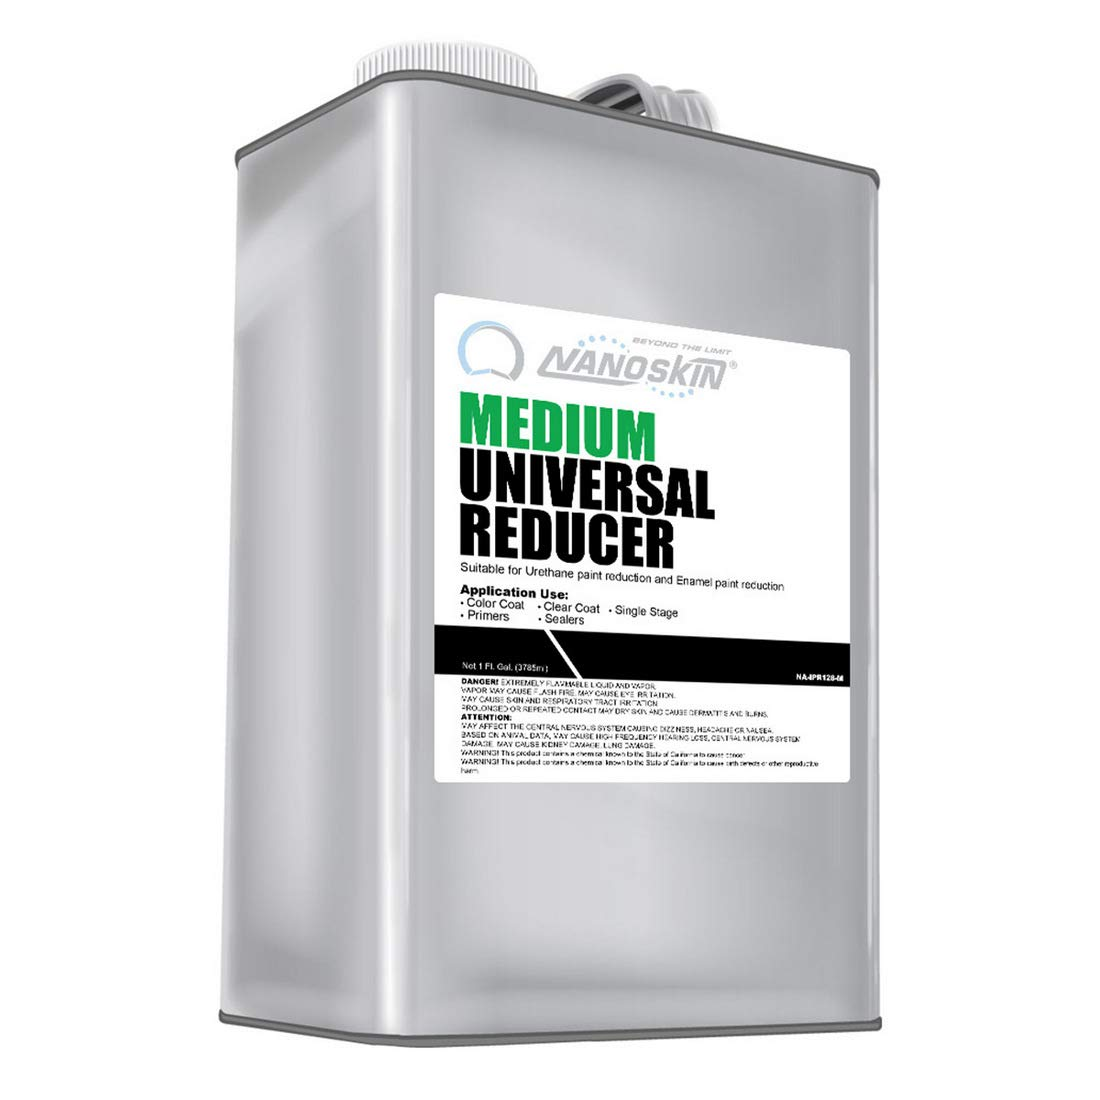 Nanoskin (NA-IPR128-M) Medium Universal Reducer - 1 Gallon